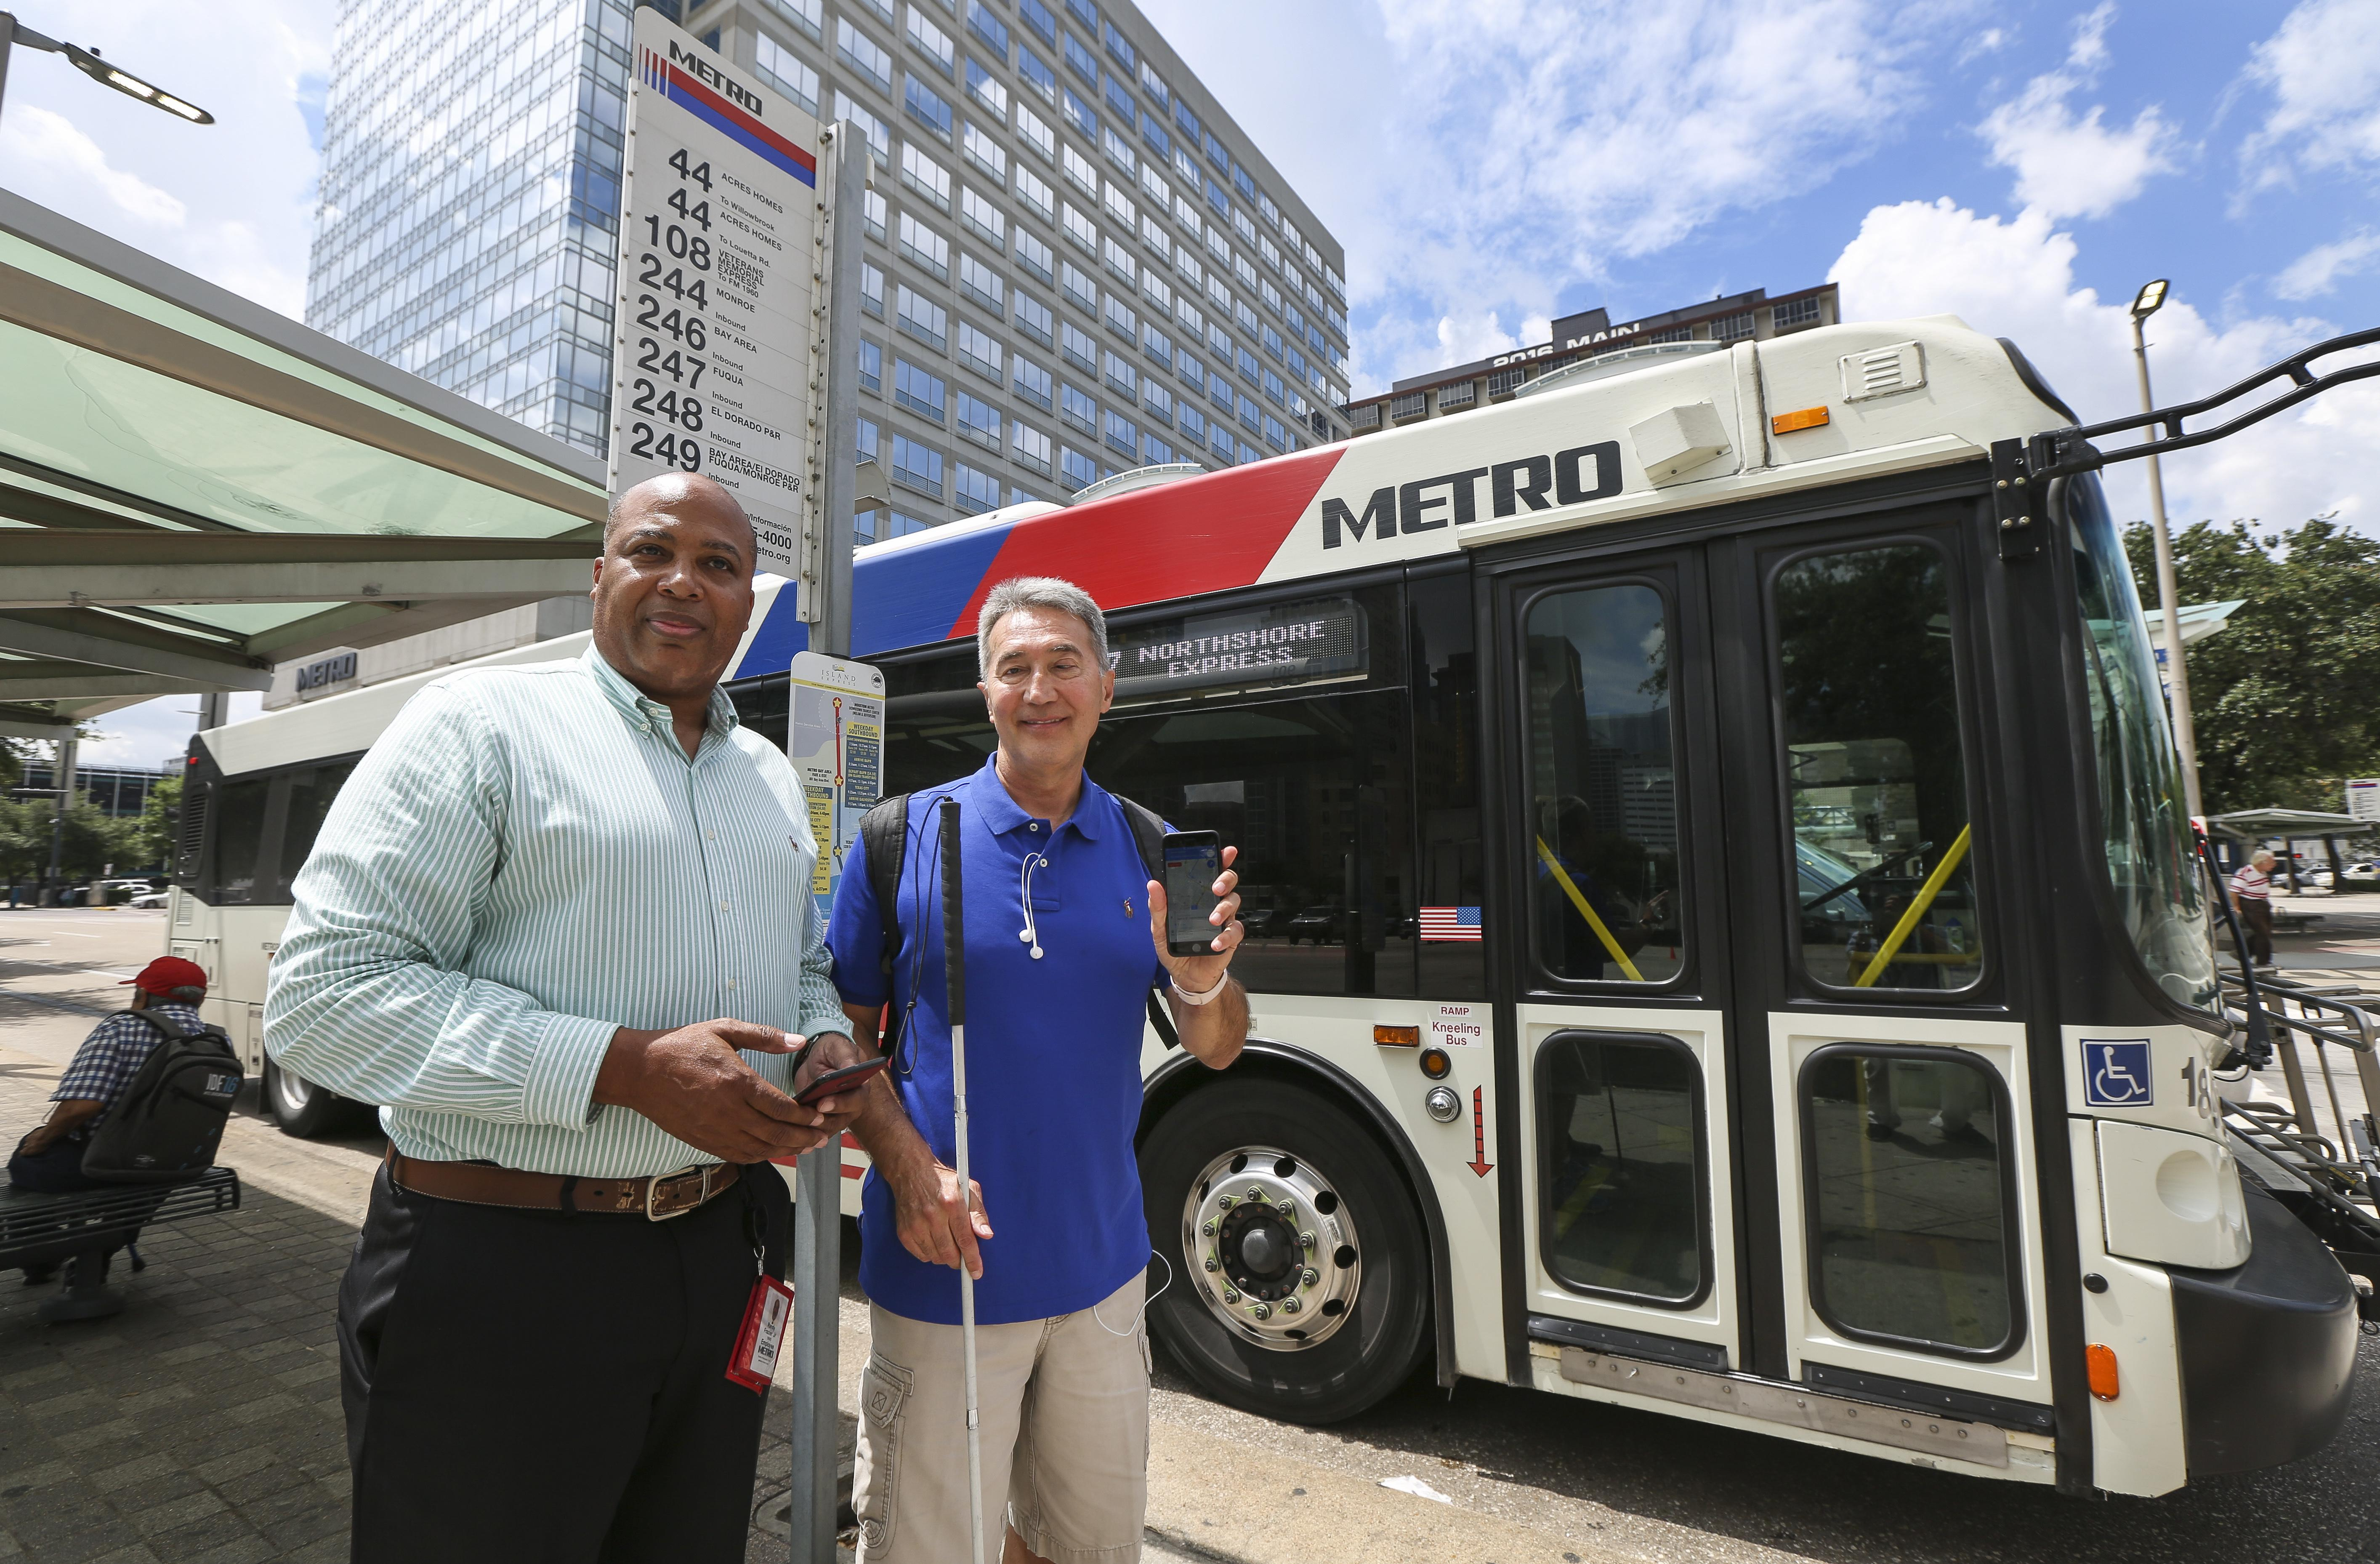 Houston Metro beacons to help visually impaired riders